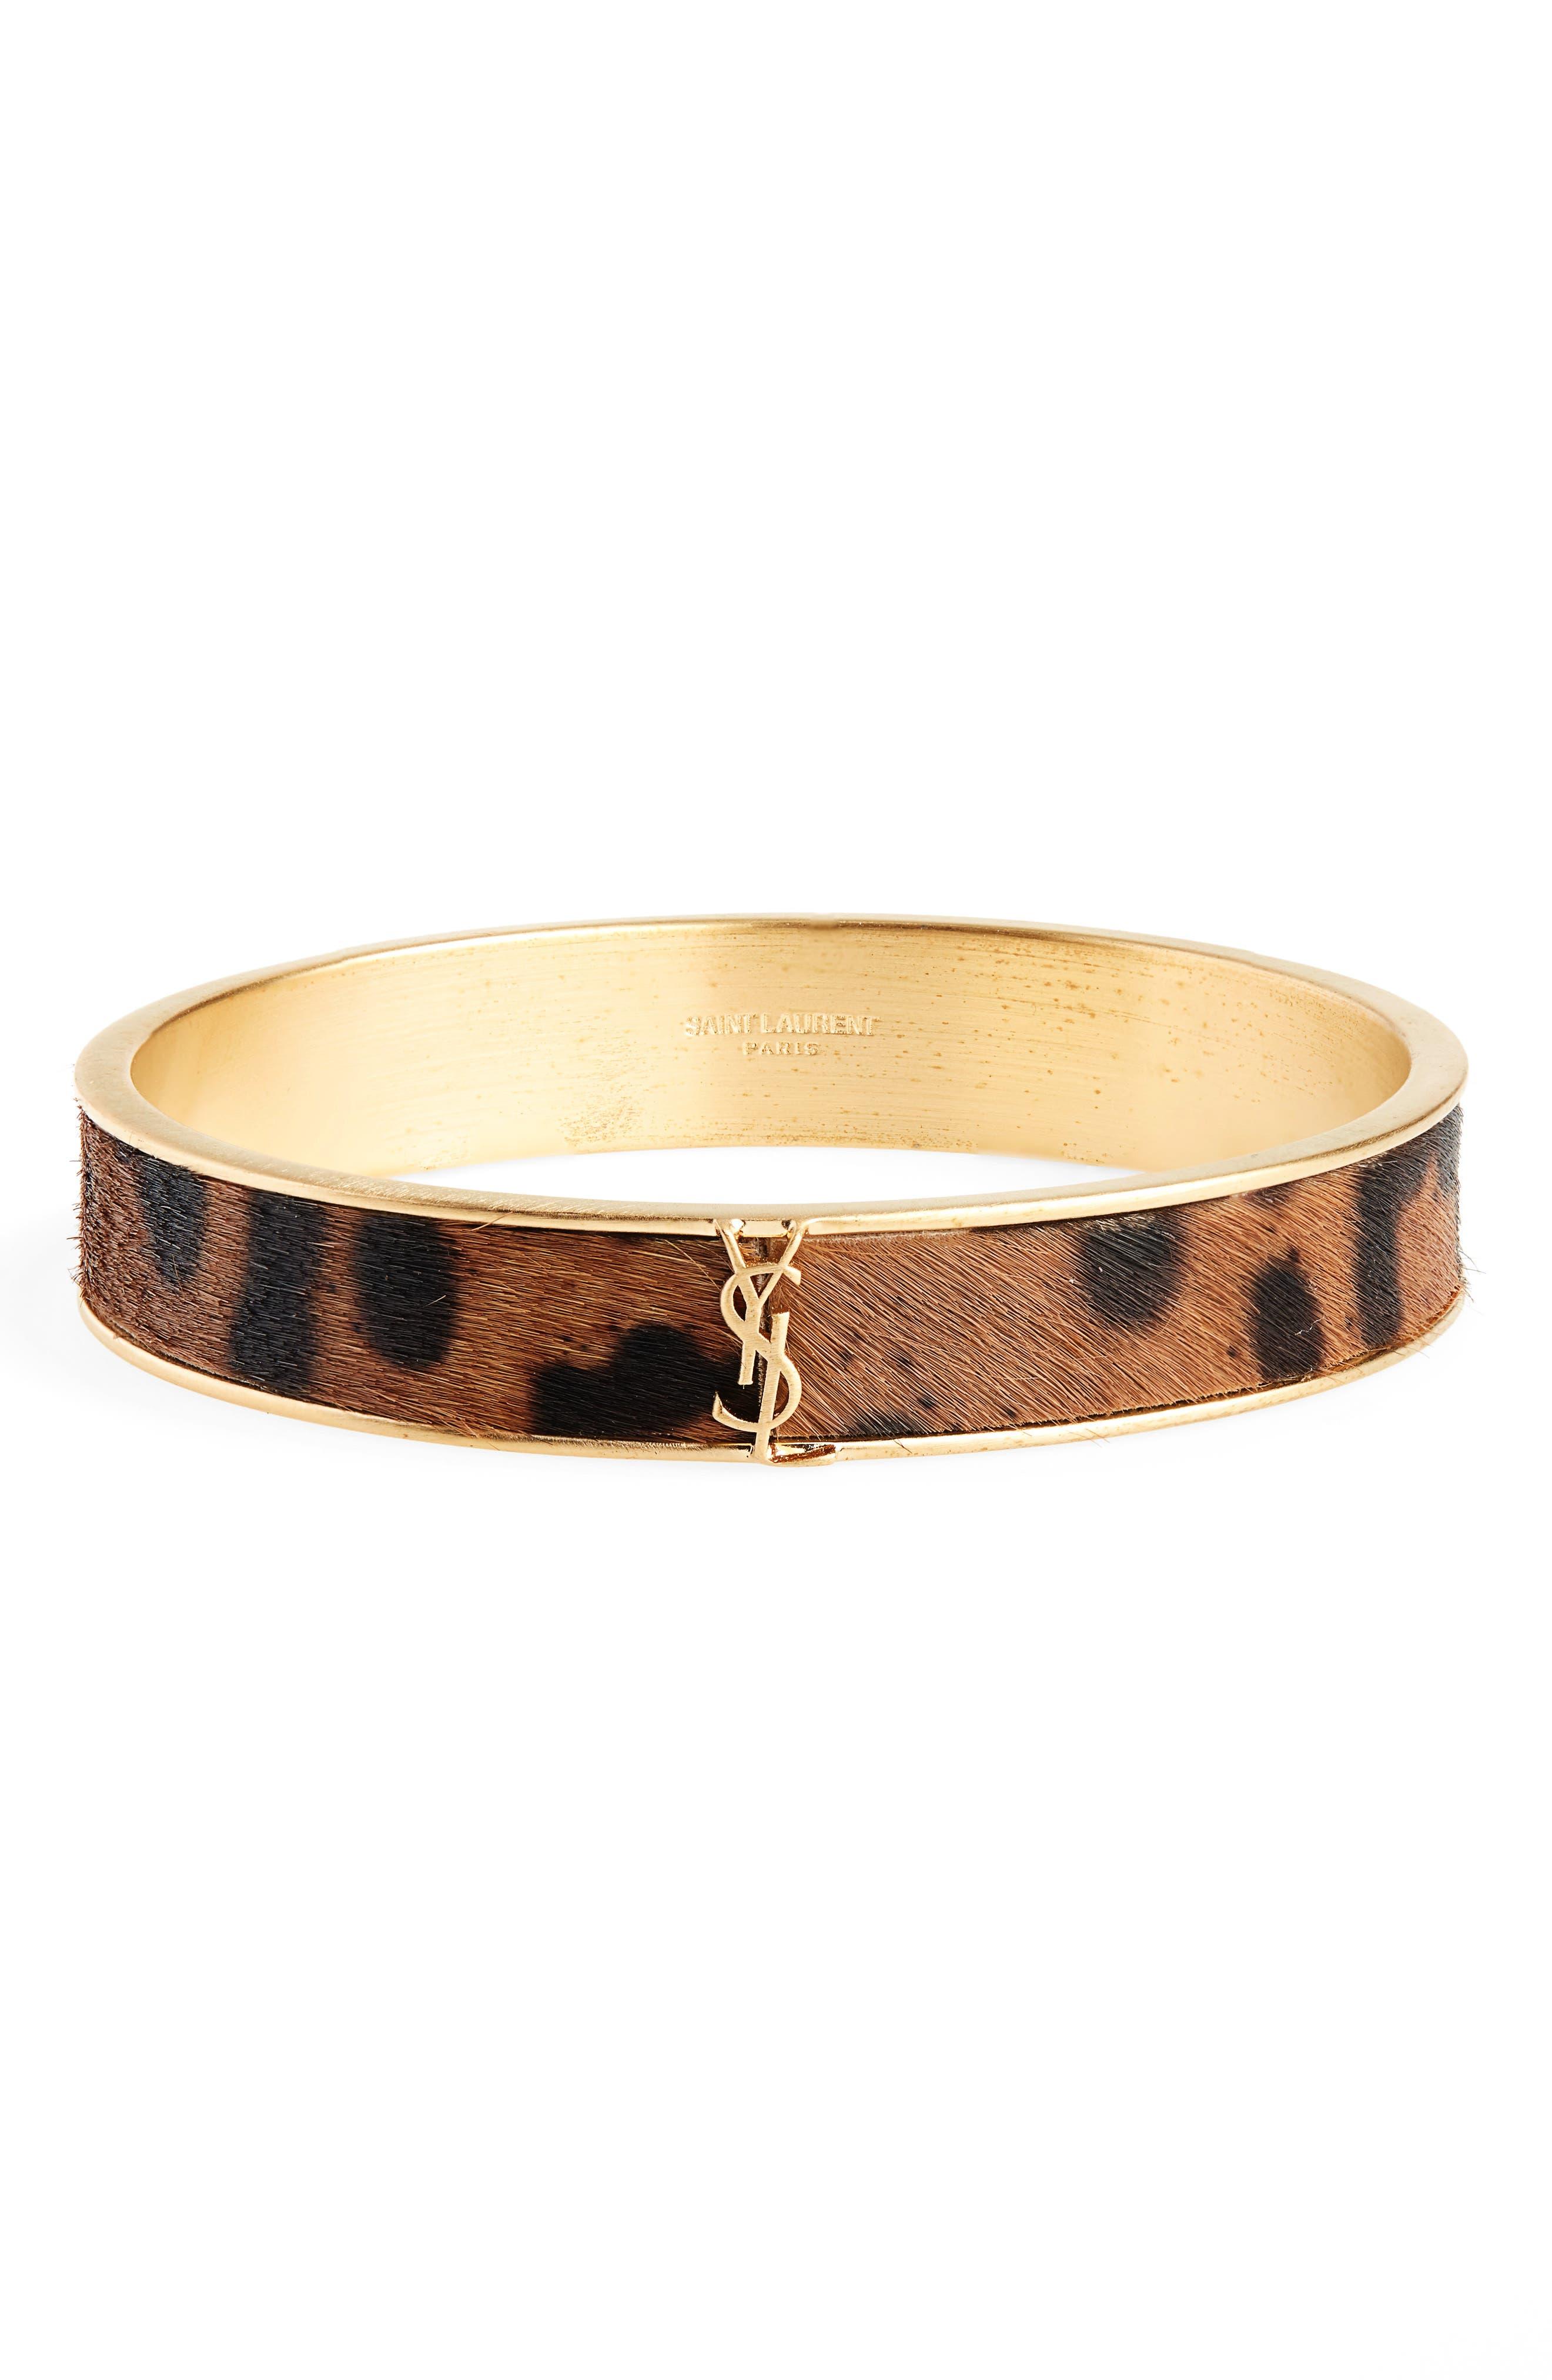 Leopard Look Genuine Calf Hair Bangle Bracelet,                             Main thumbnail 1, color,                             200